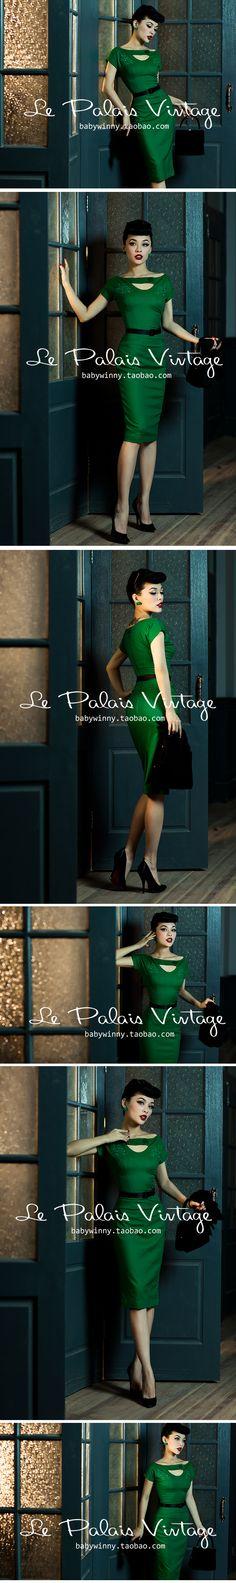 le palais vintage 优雅复古经典祖母绿镂空刺绣紧身连衣裙0.35-淘宝网